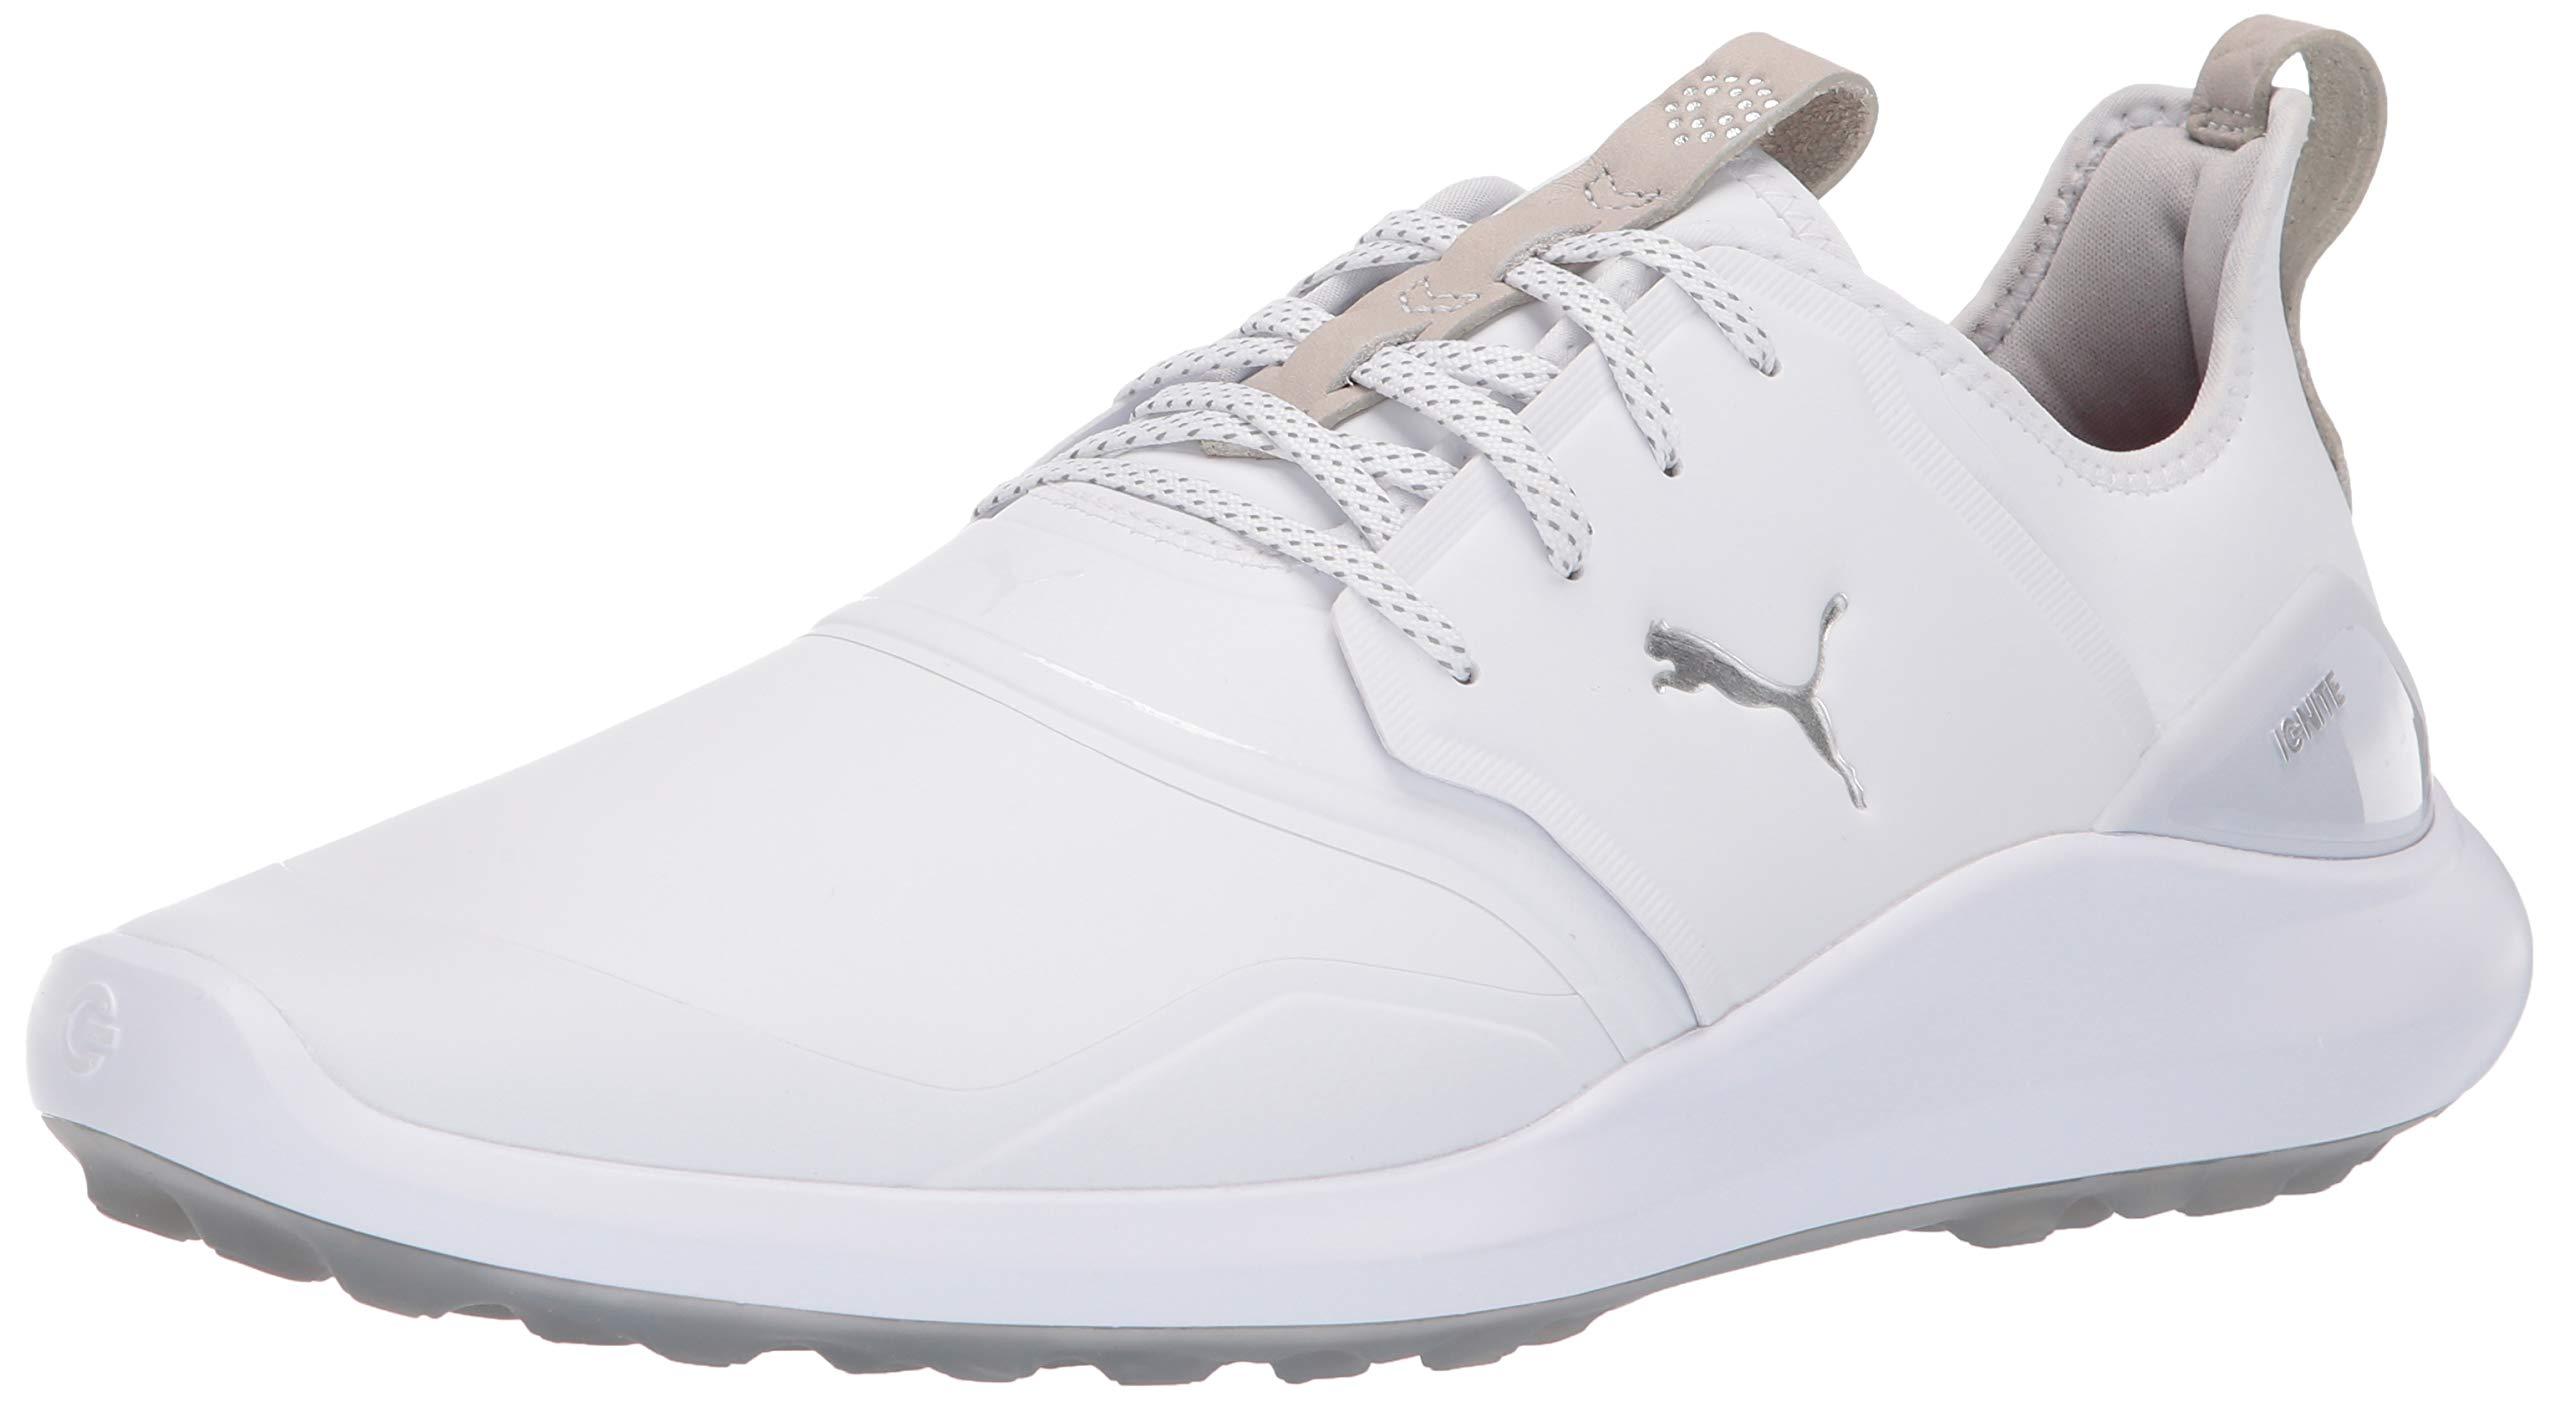 Puma Golf Men's Ignite Nxt Pro Golf Shoe White-Puma Silver-Gray Violet, 14 M US by PUMA